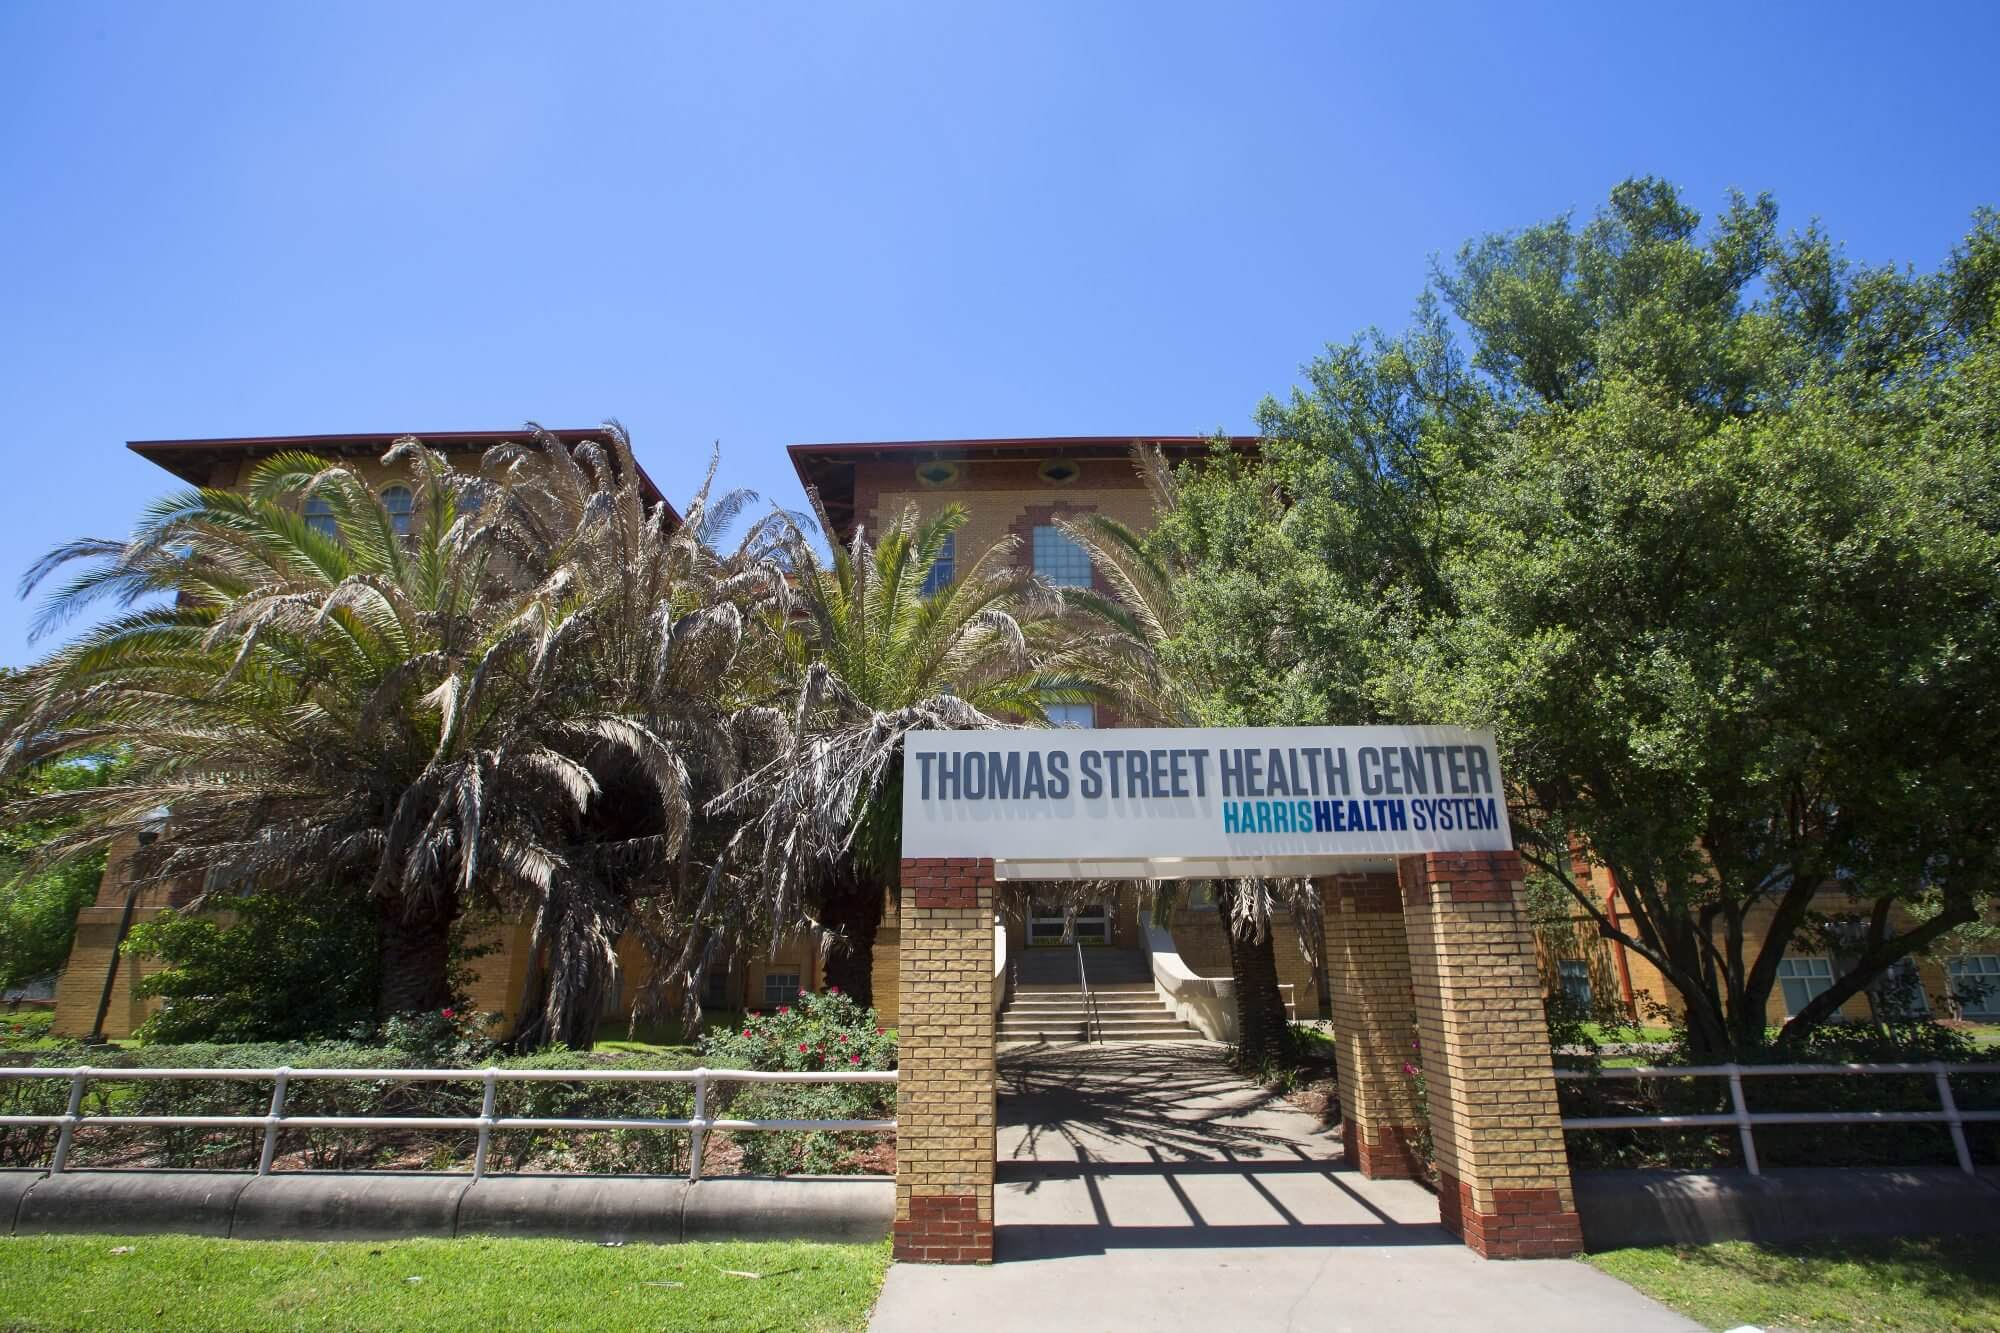 The Thomas Street Health Center.